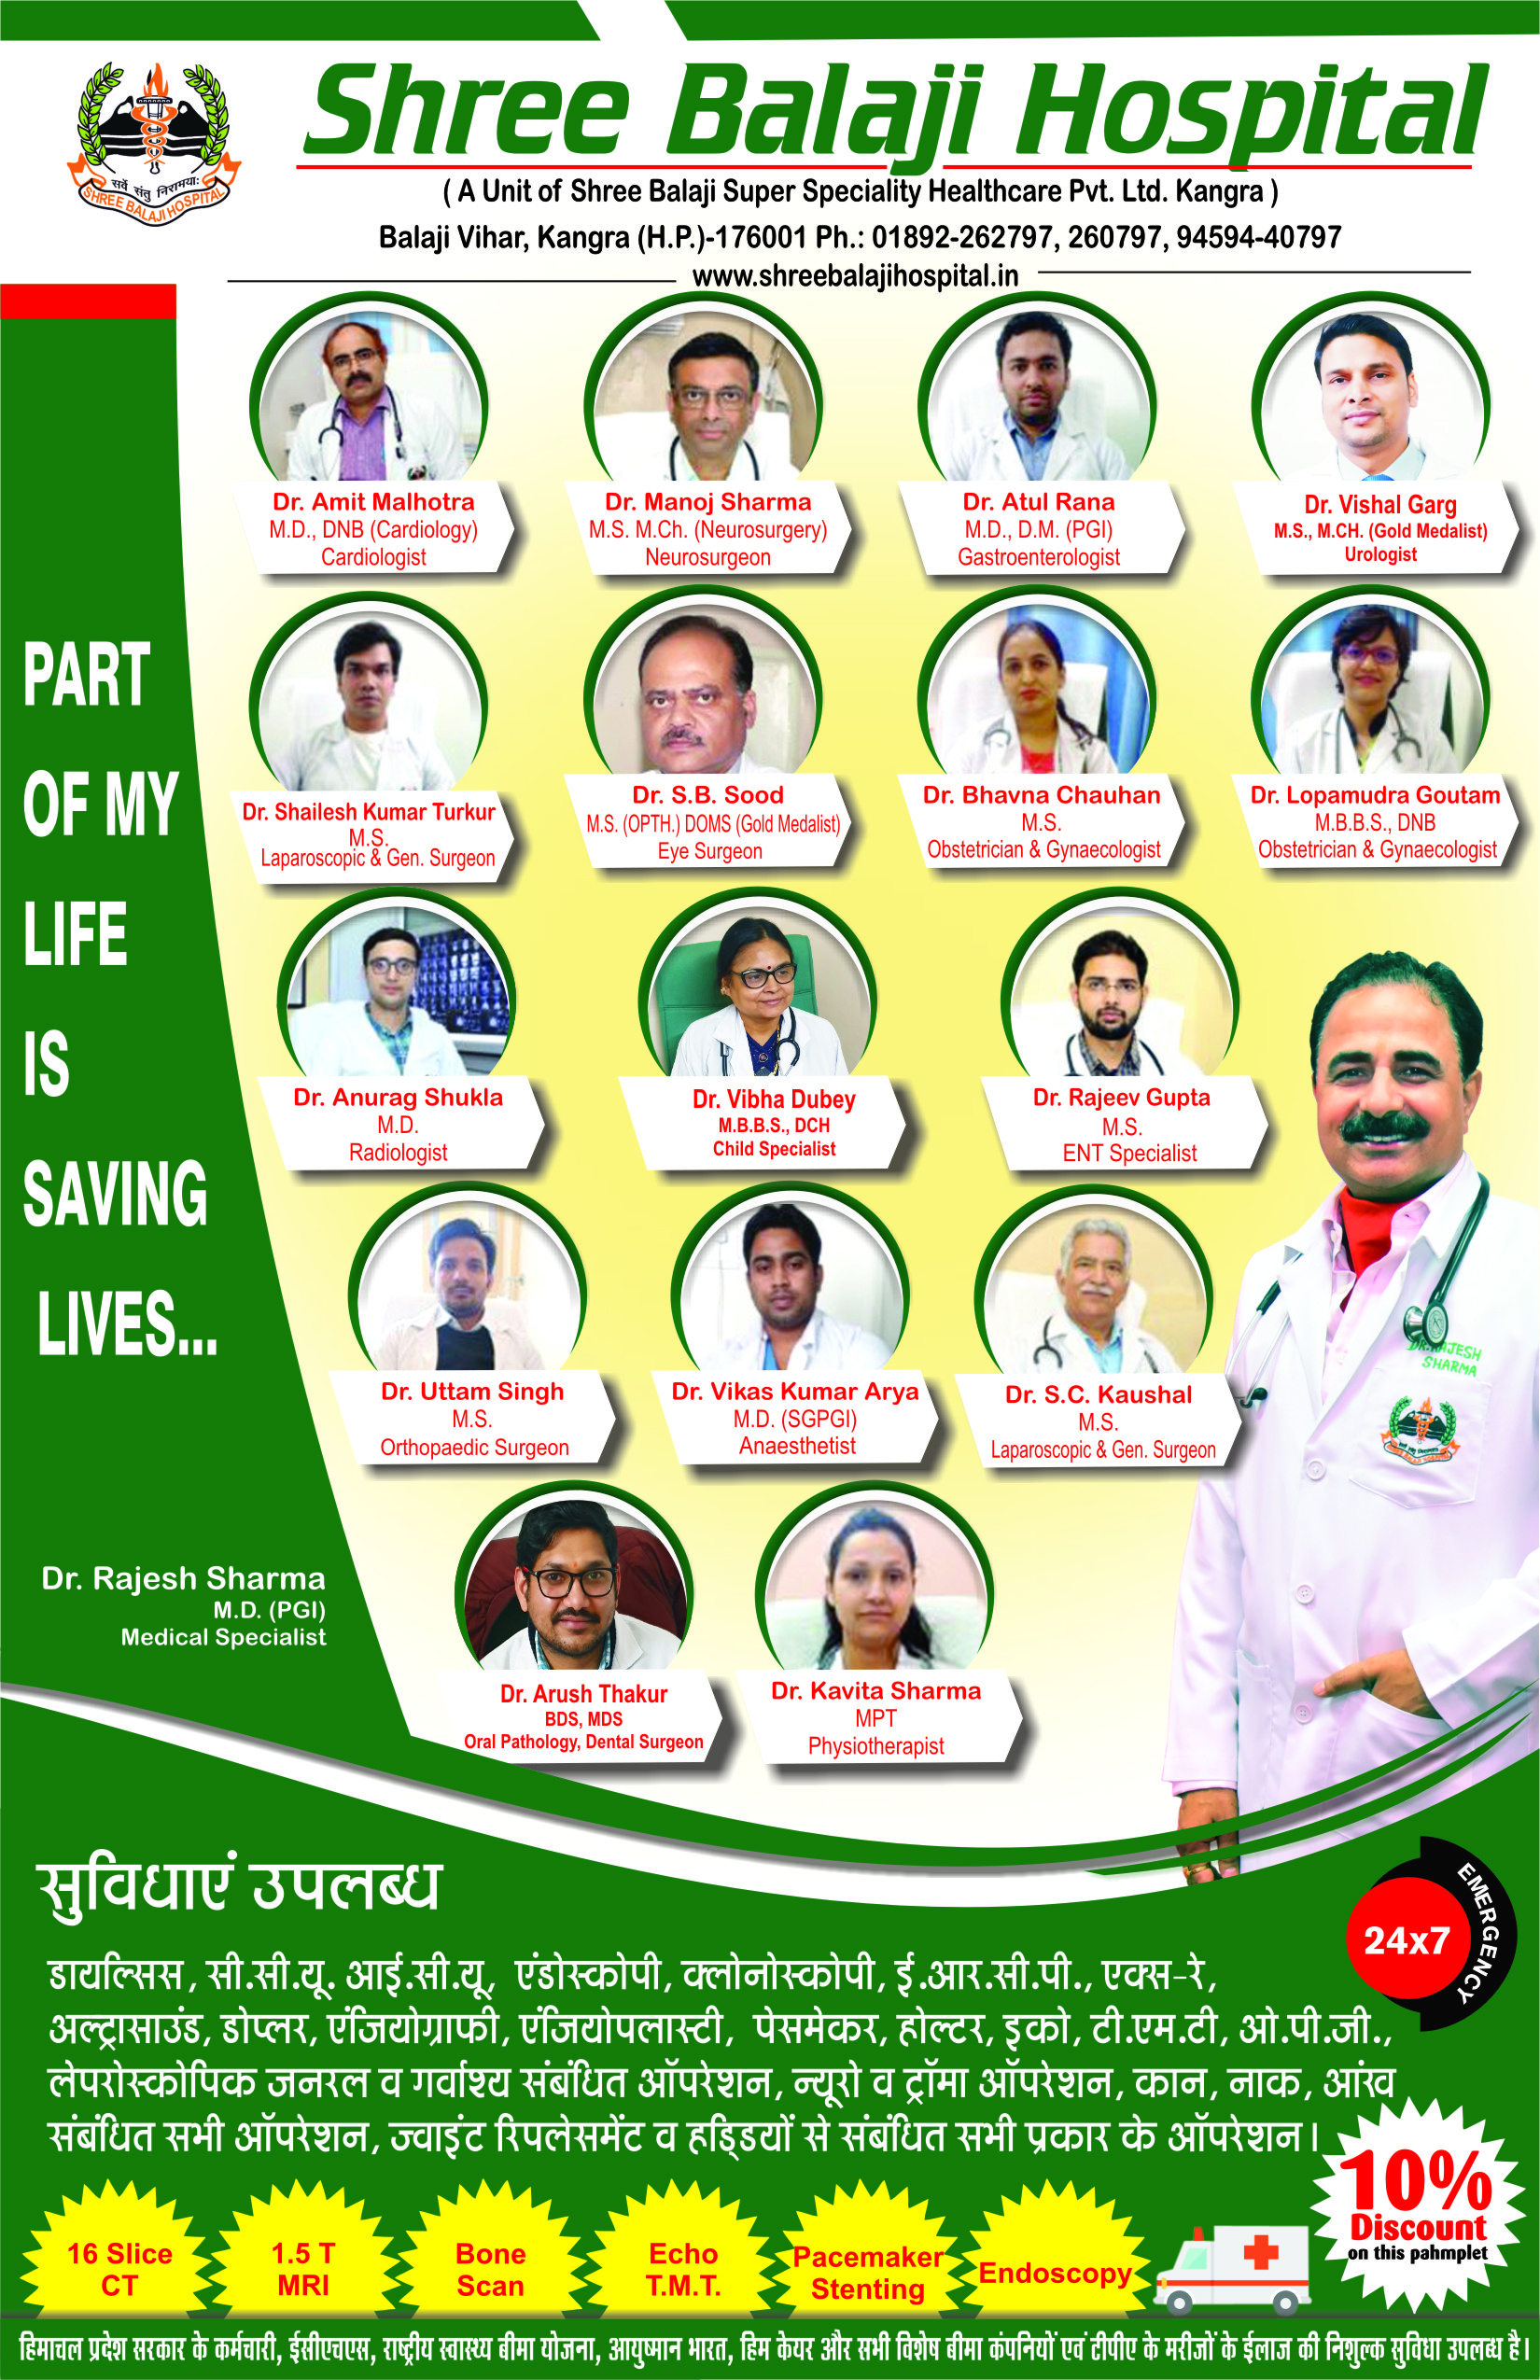 Shree Balaji Hospital